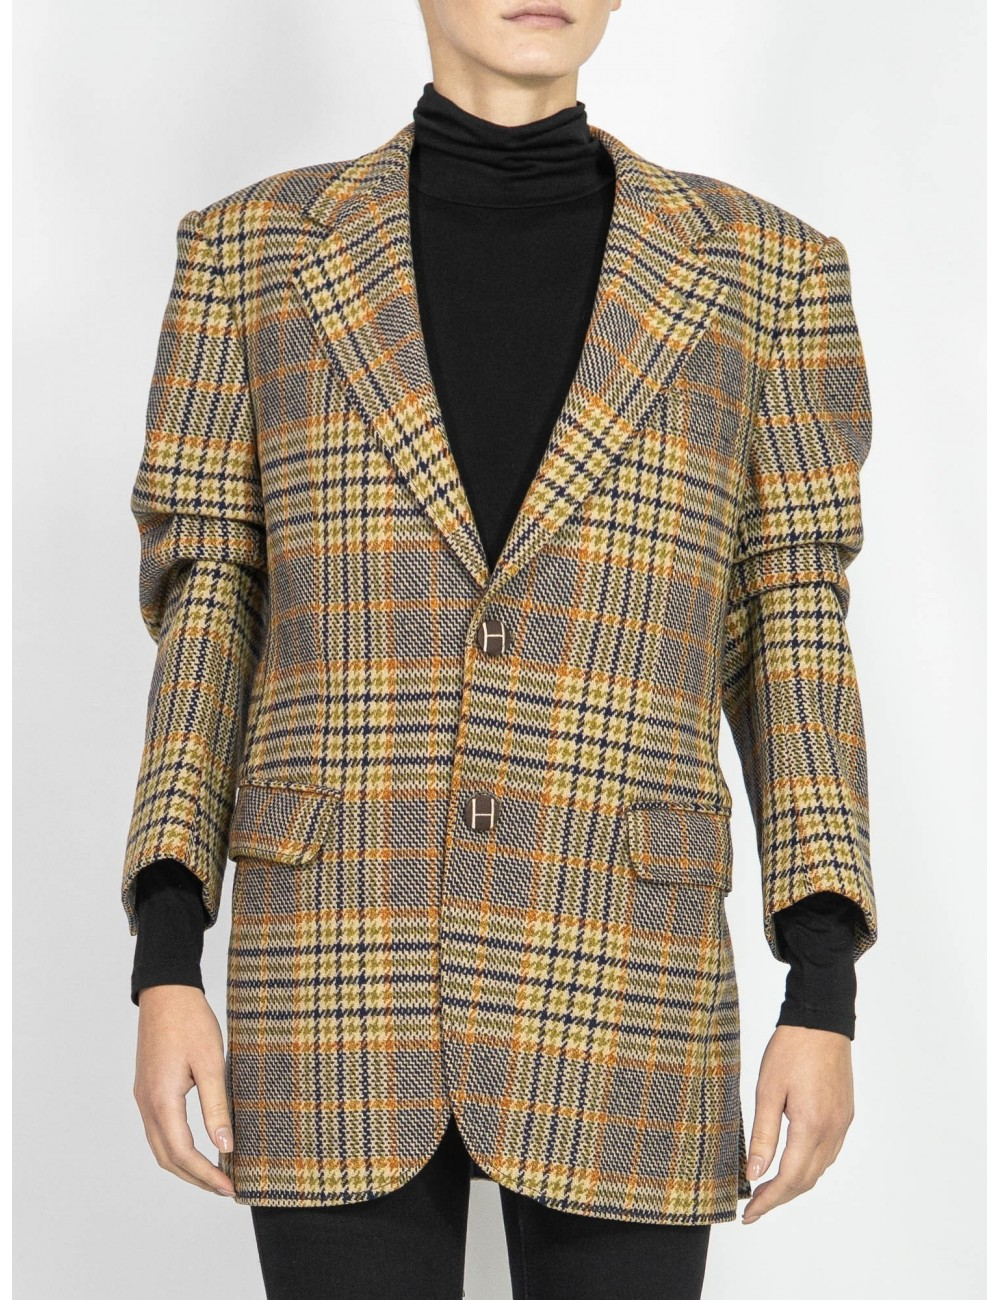 Upcycled organic fabrics vintage jacket Hooldra